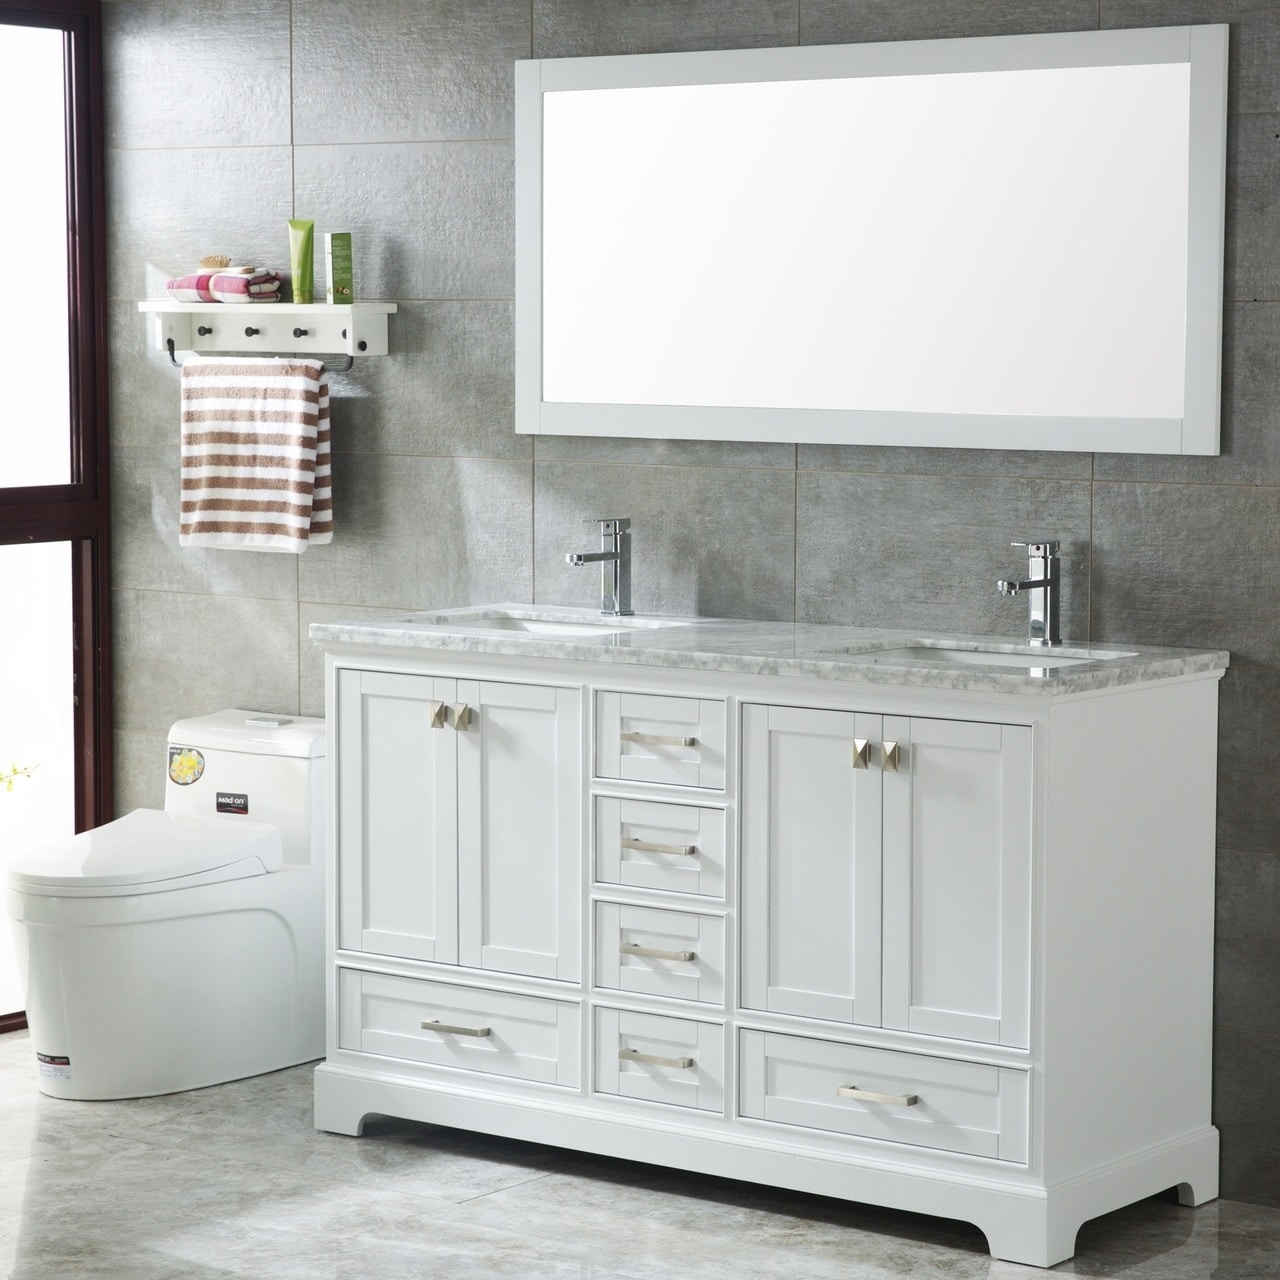 Double Sinks Modern Bathroom Vanity Set